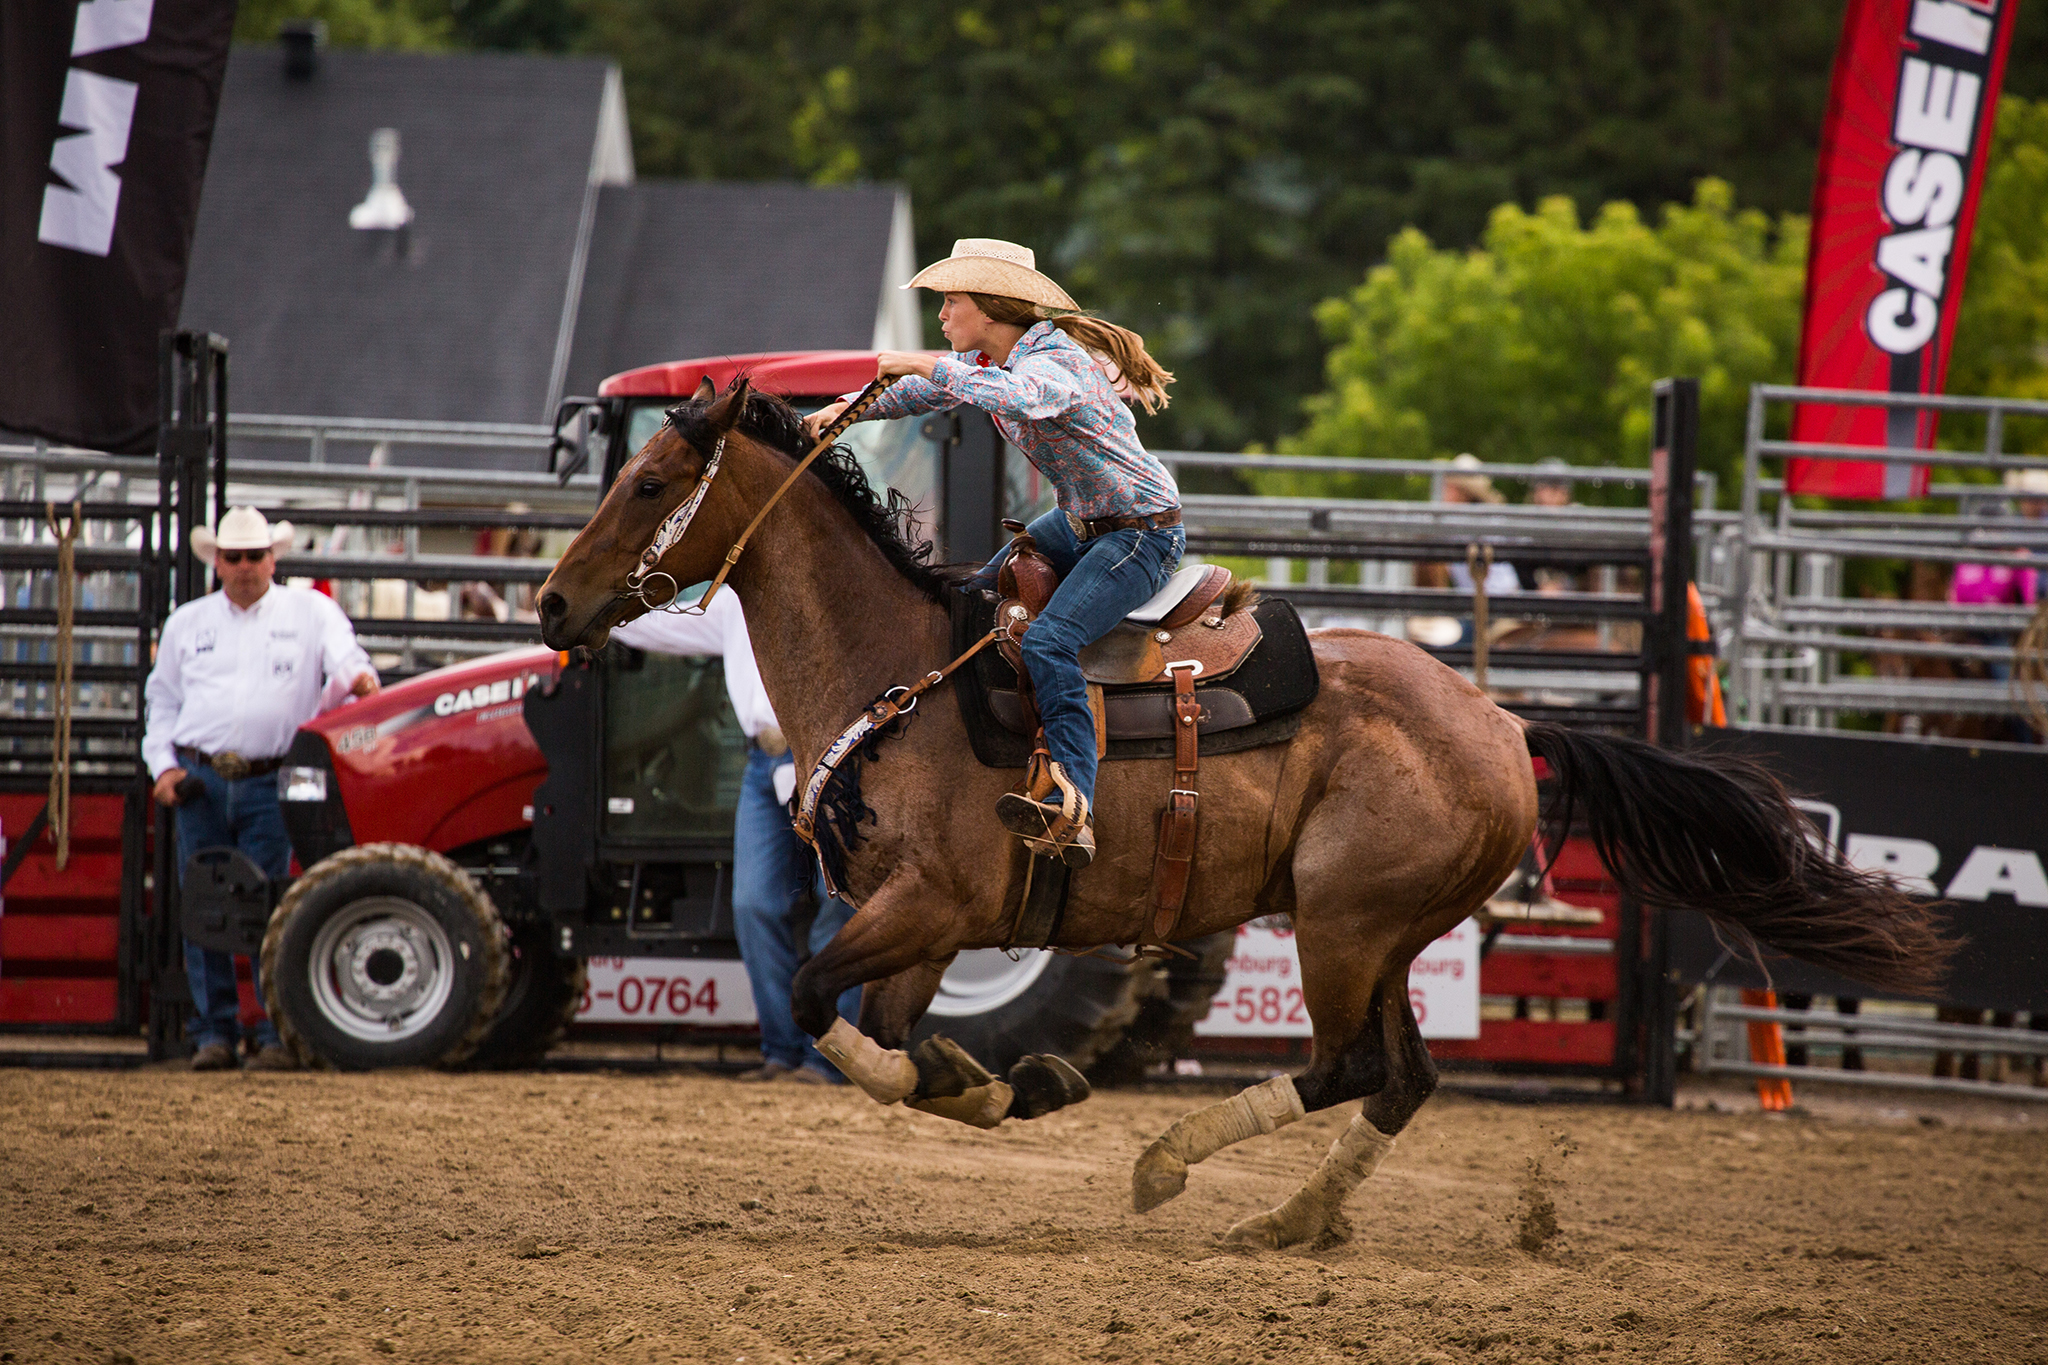 Ram Rodeo Tour - Beachburg - 23 July 2016 - 025 (2048).jpg